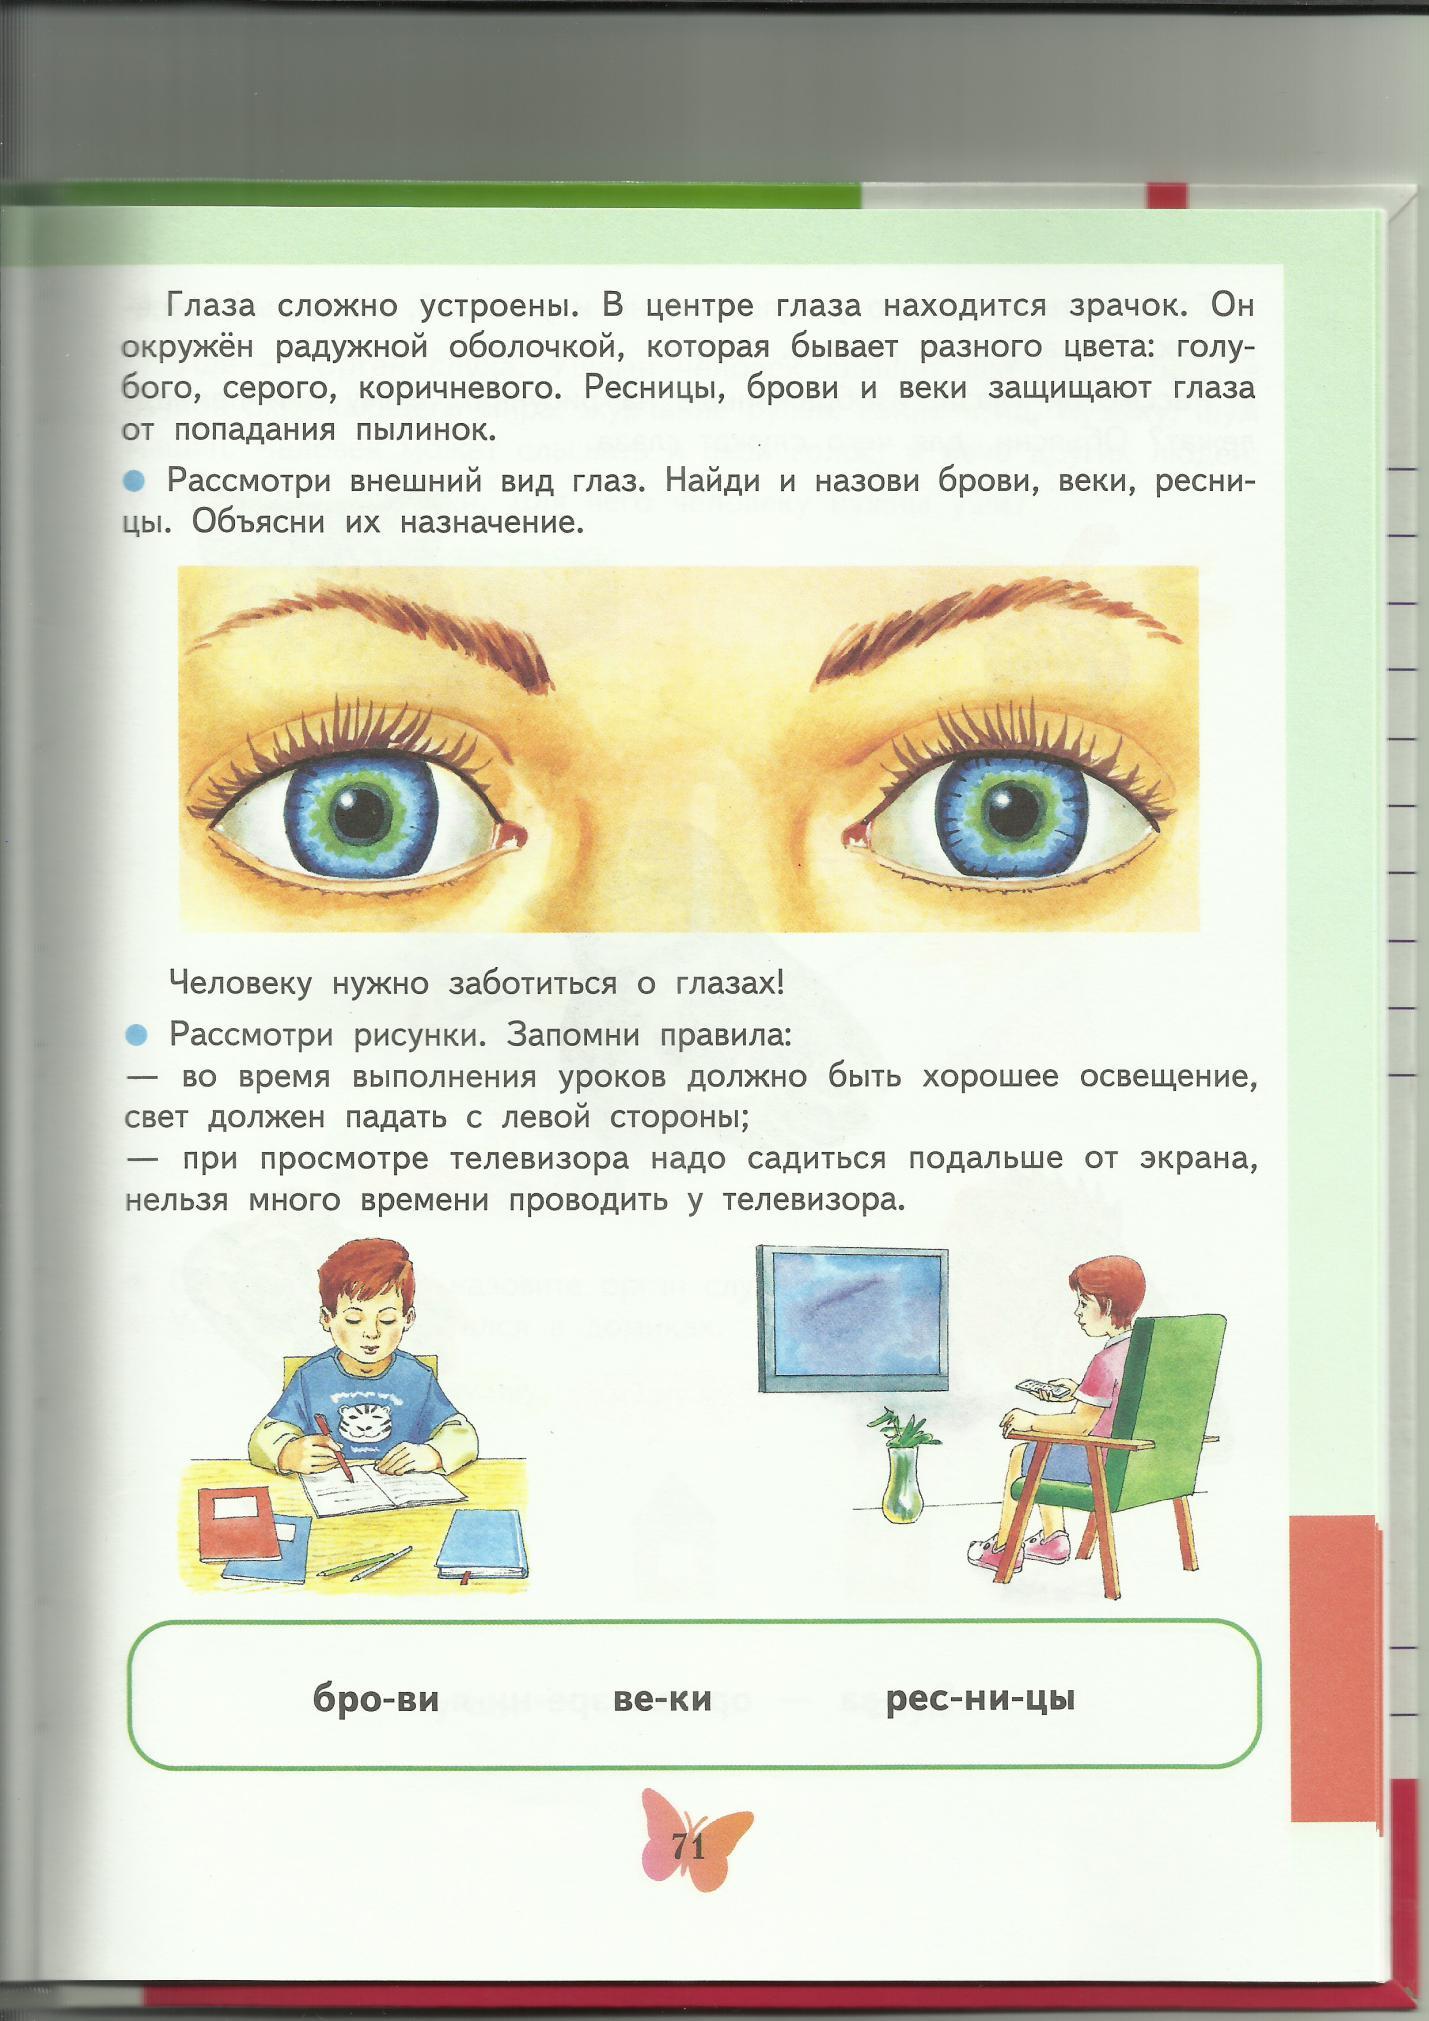 C:\Users\пр\Desktop\ТЕТРАДИ\человек\15.tif